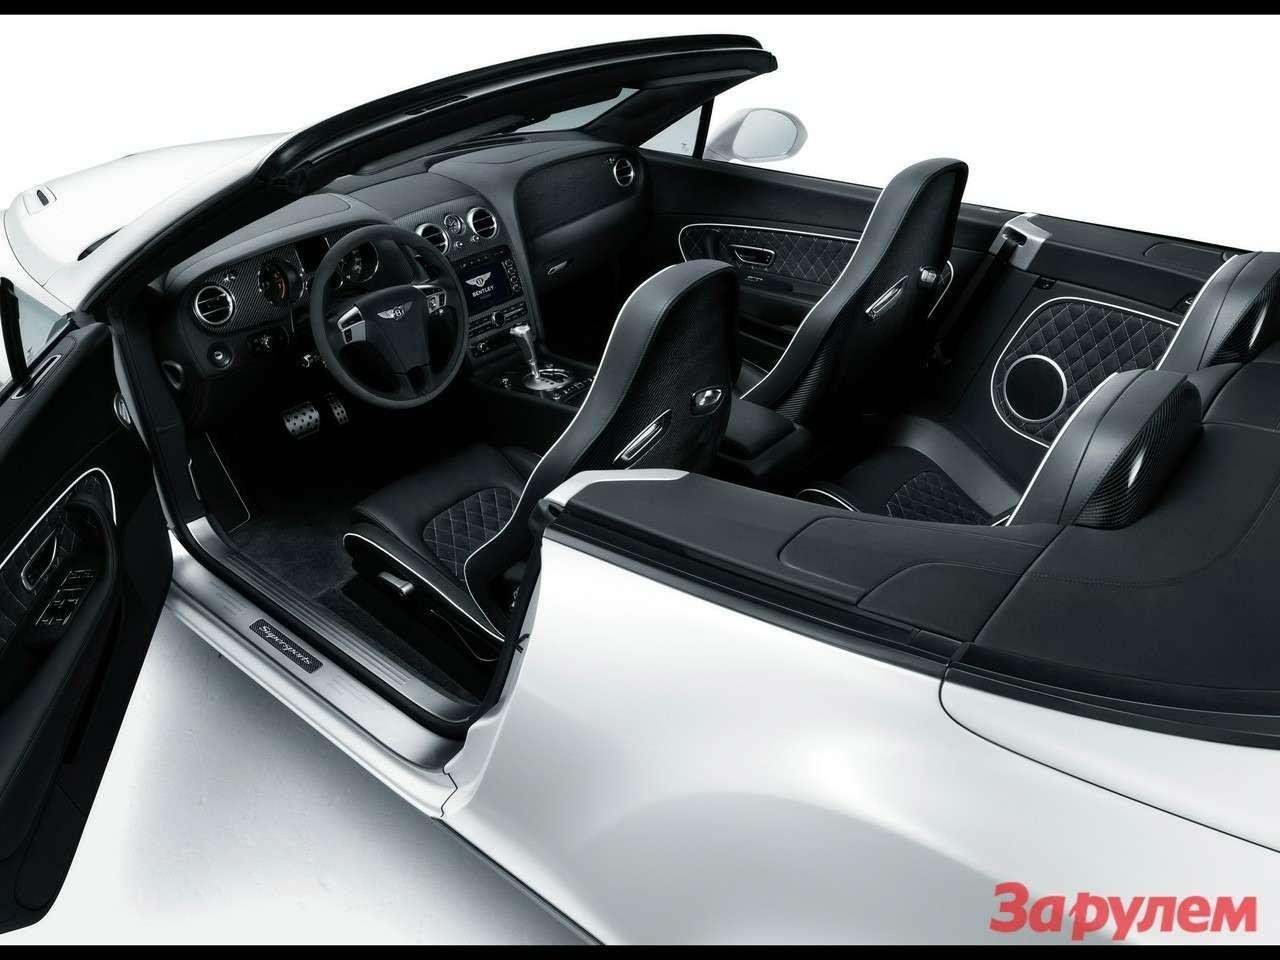 2010-Bentley-Continental-Supersports-Convertible-Interior-1280x960